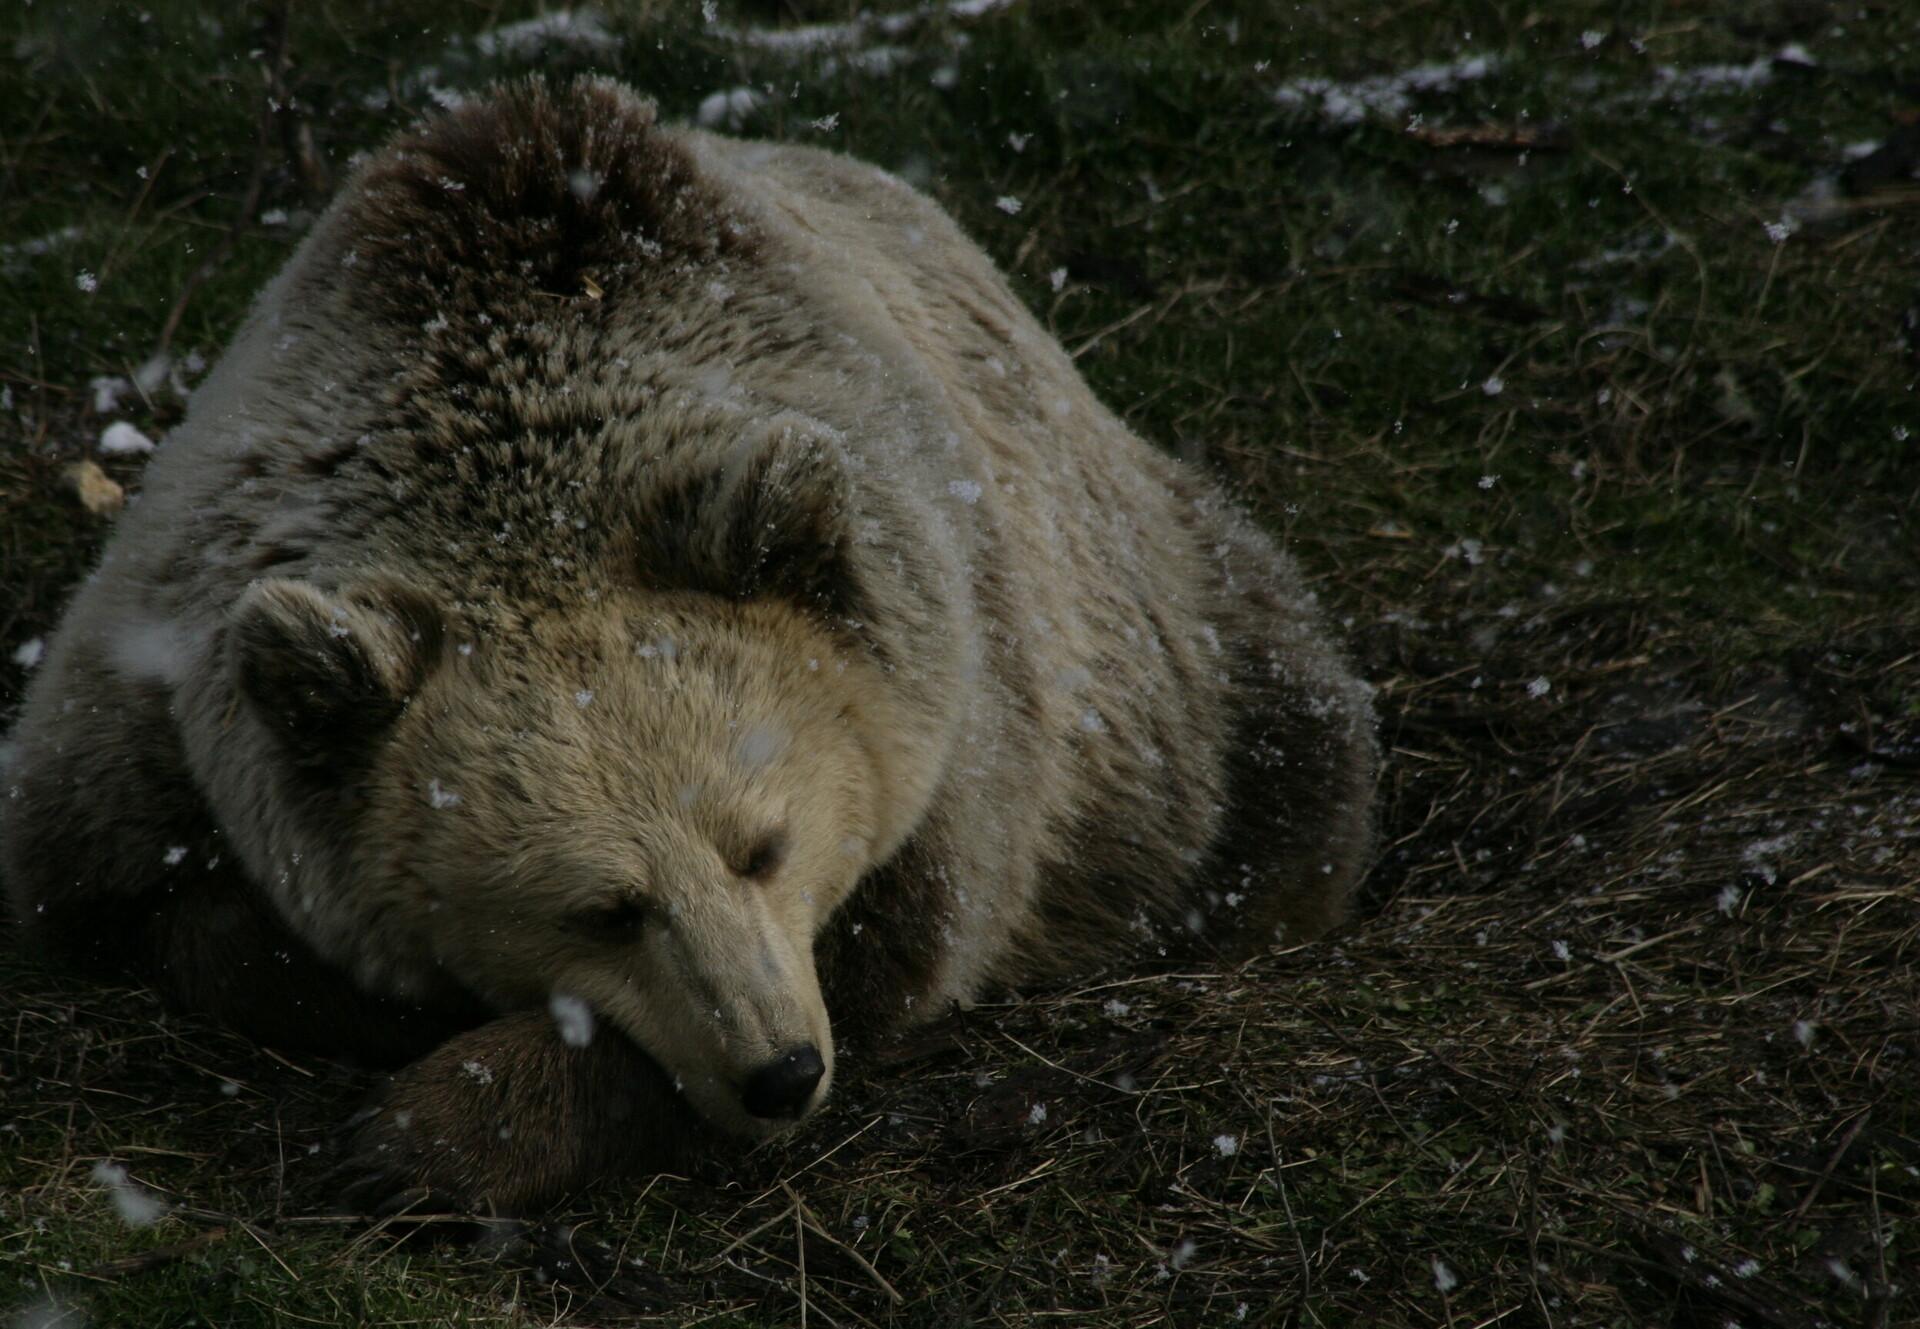 Bears sitting in snow